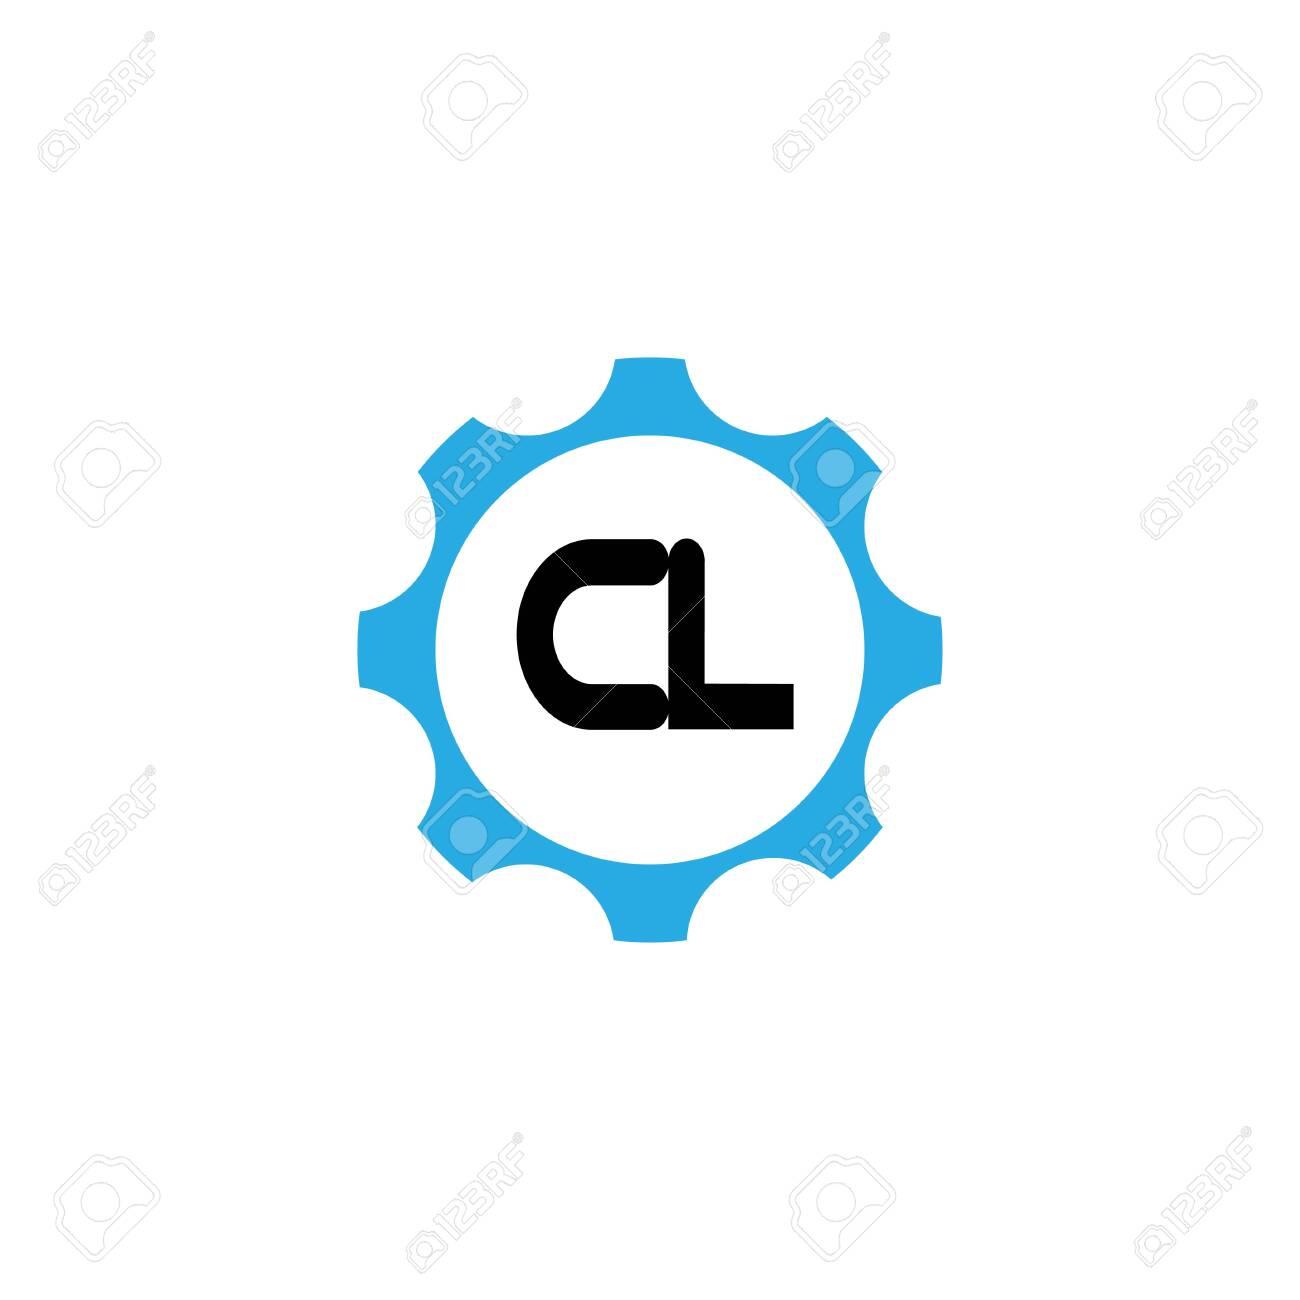 Initial Letter Logo CL Template Vector Design - 119226917